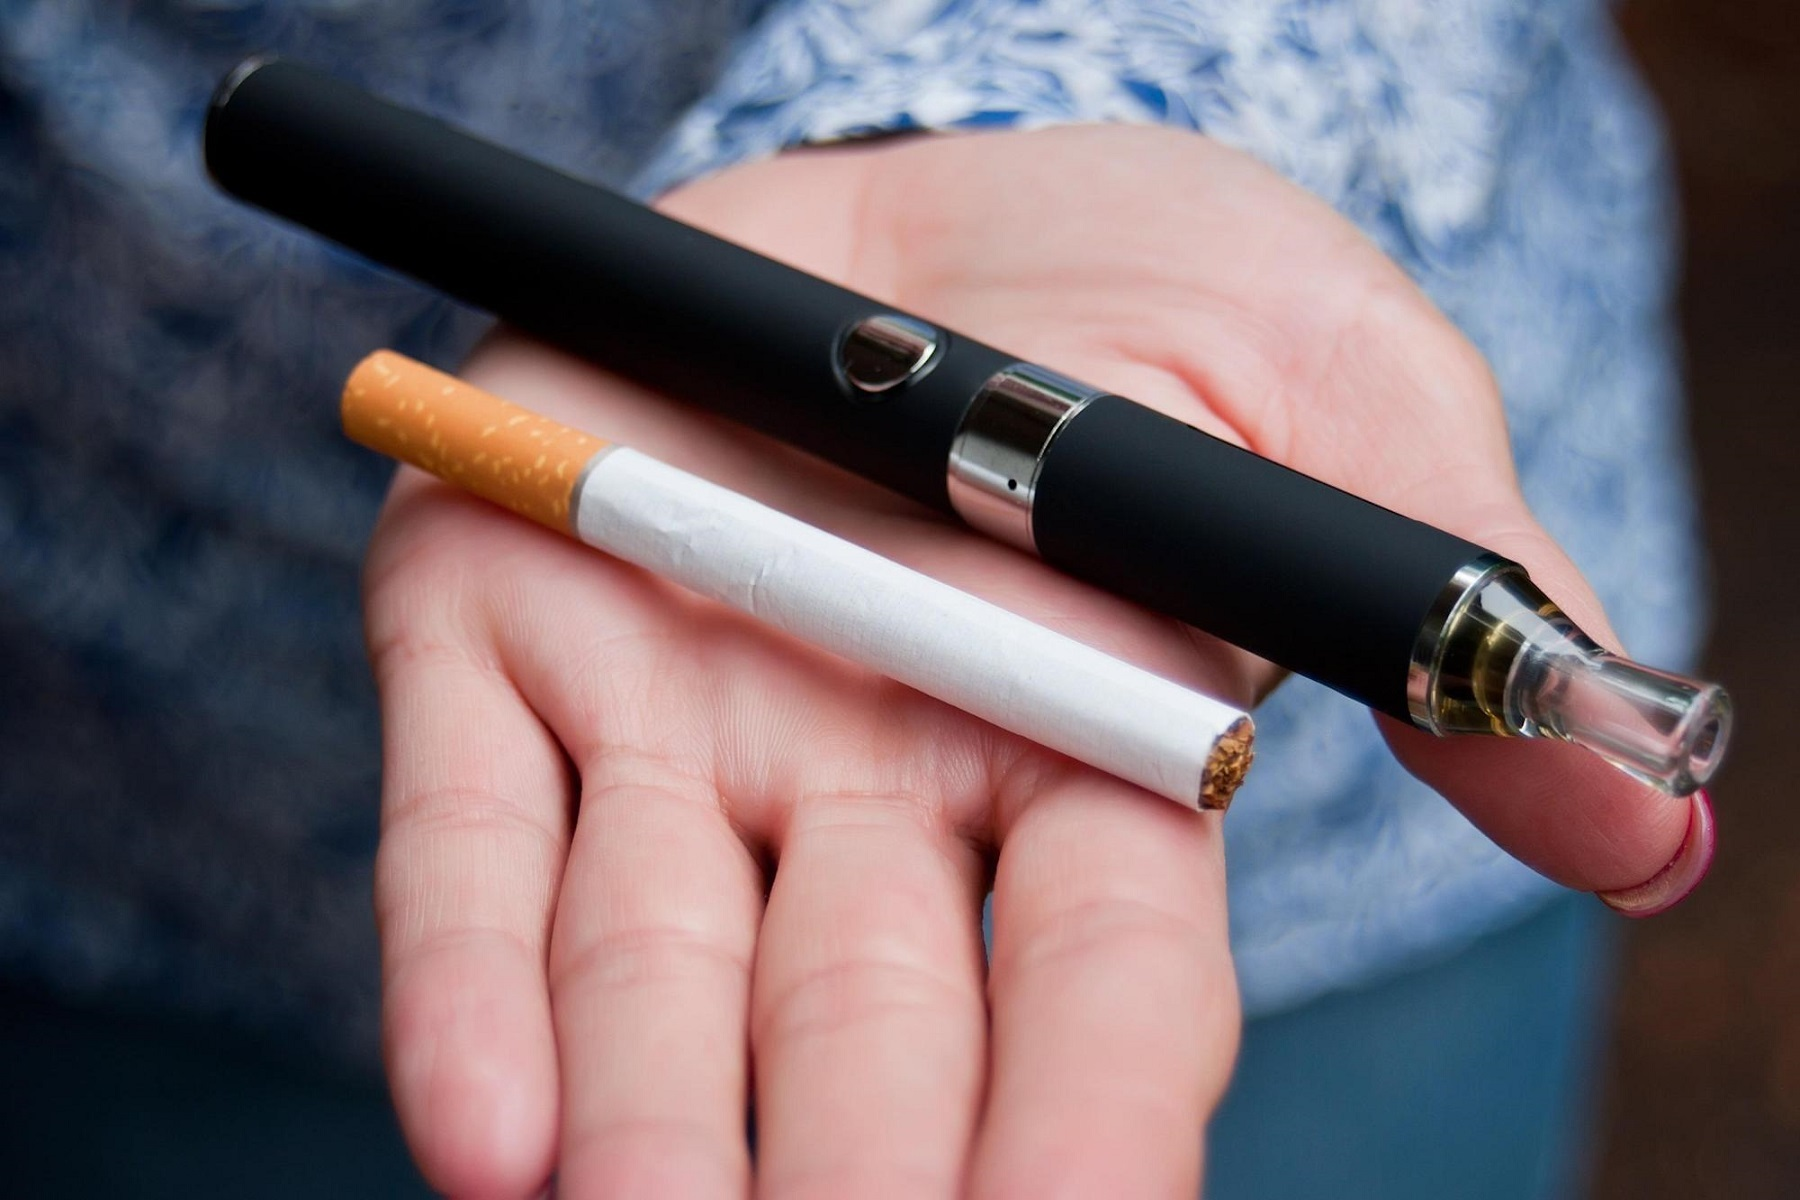 Philip Morris: Θα καταργήσει σταδιακά τα τσιγάρα στην Ιαπωνία μέσα σε μια δεκαετία